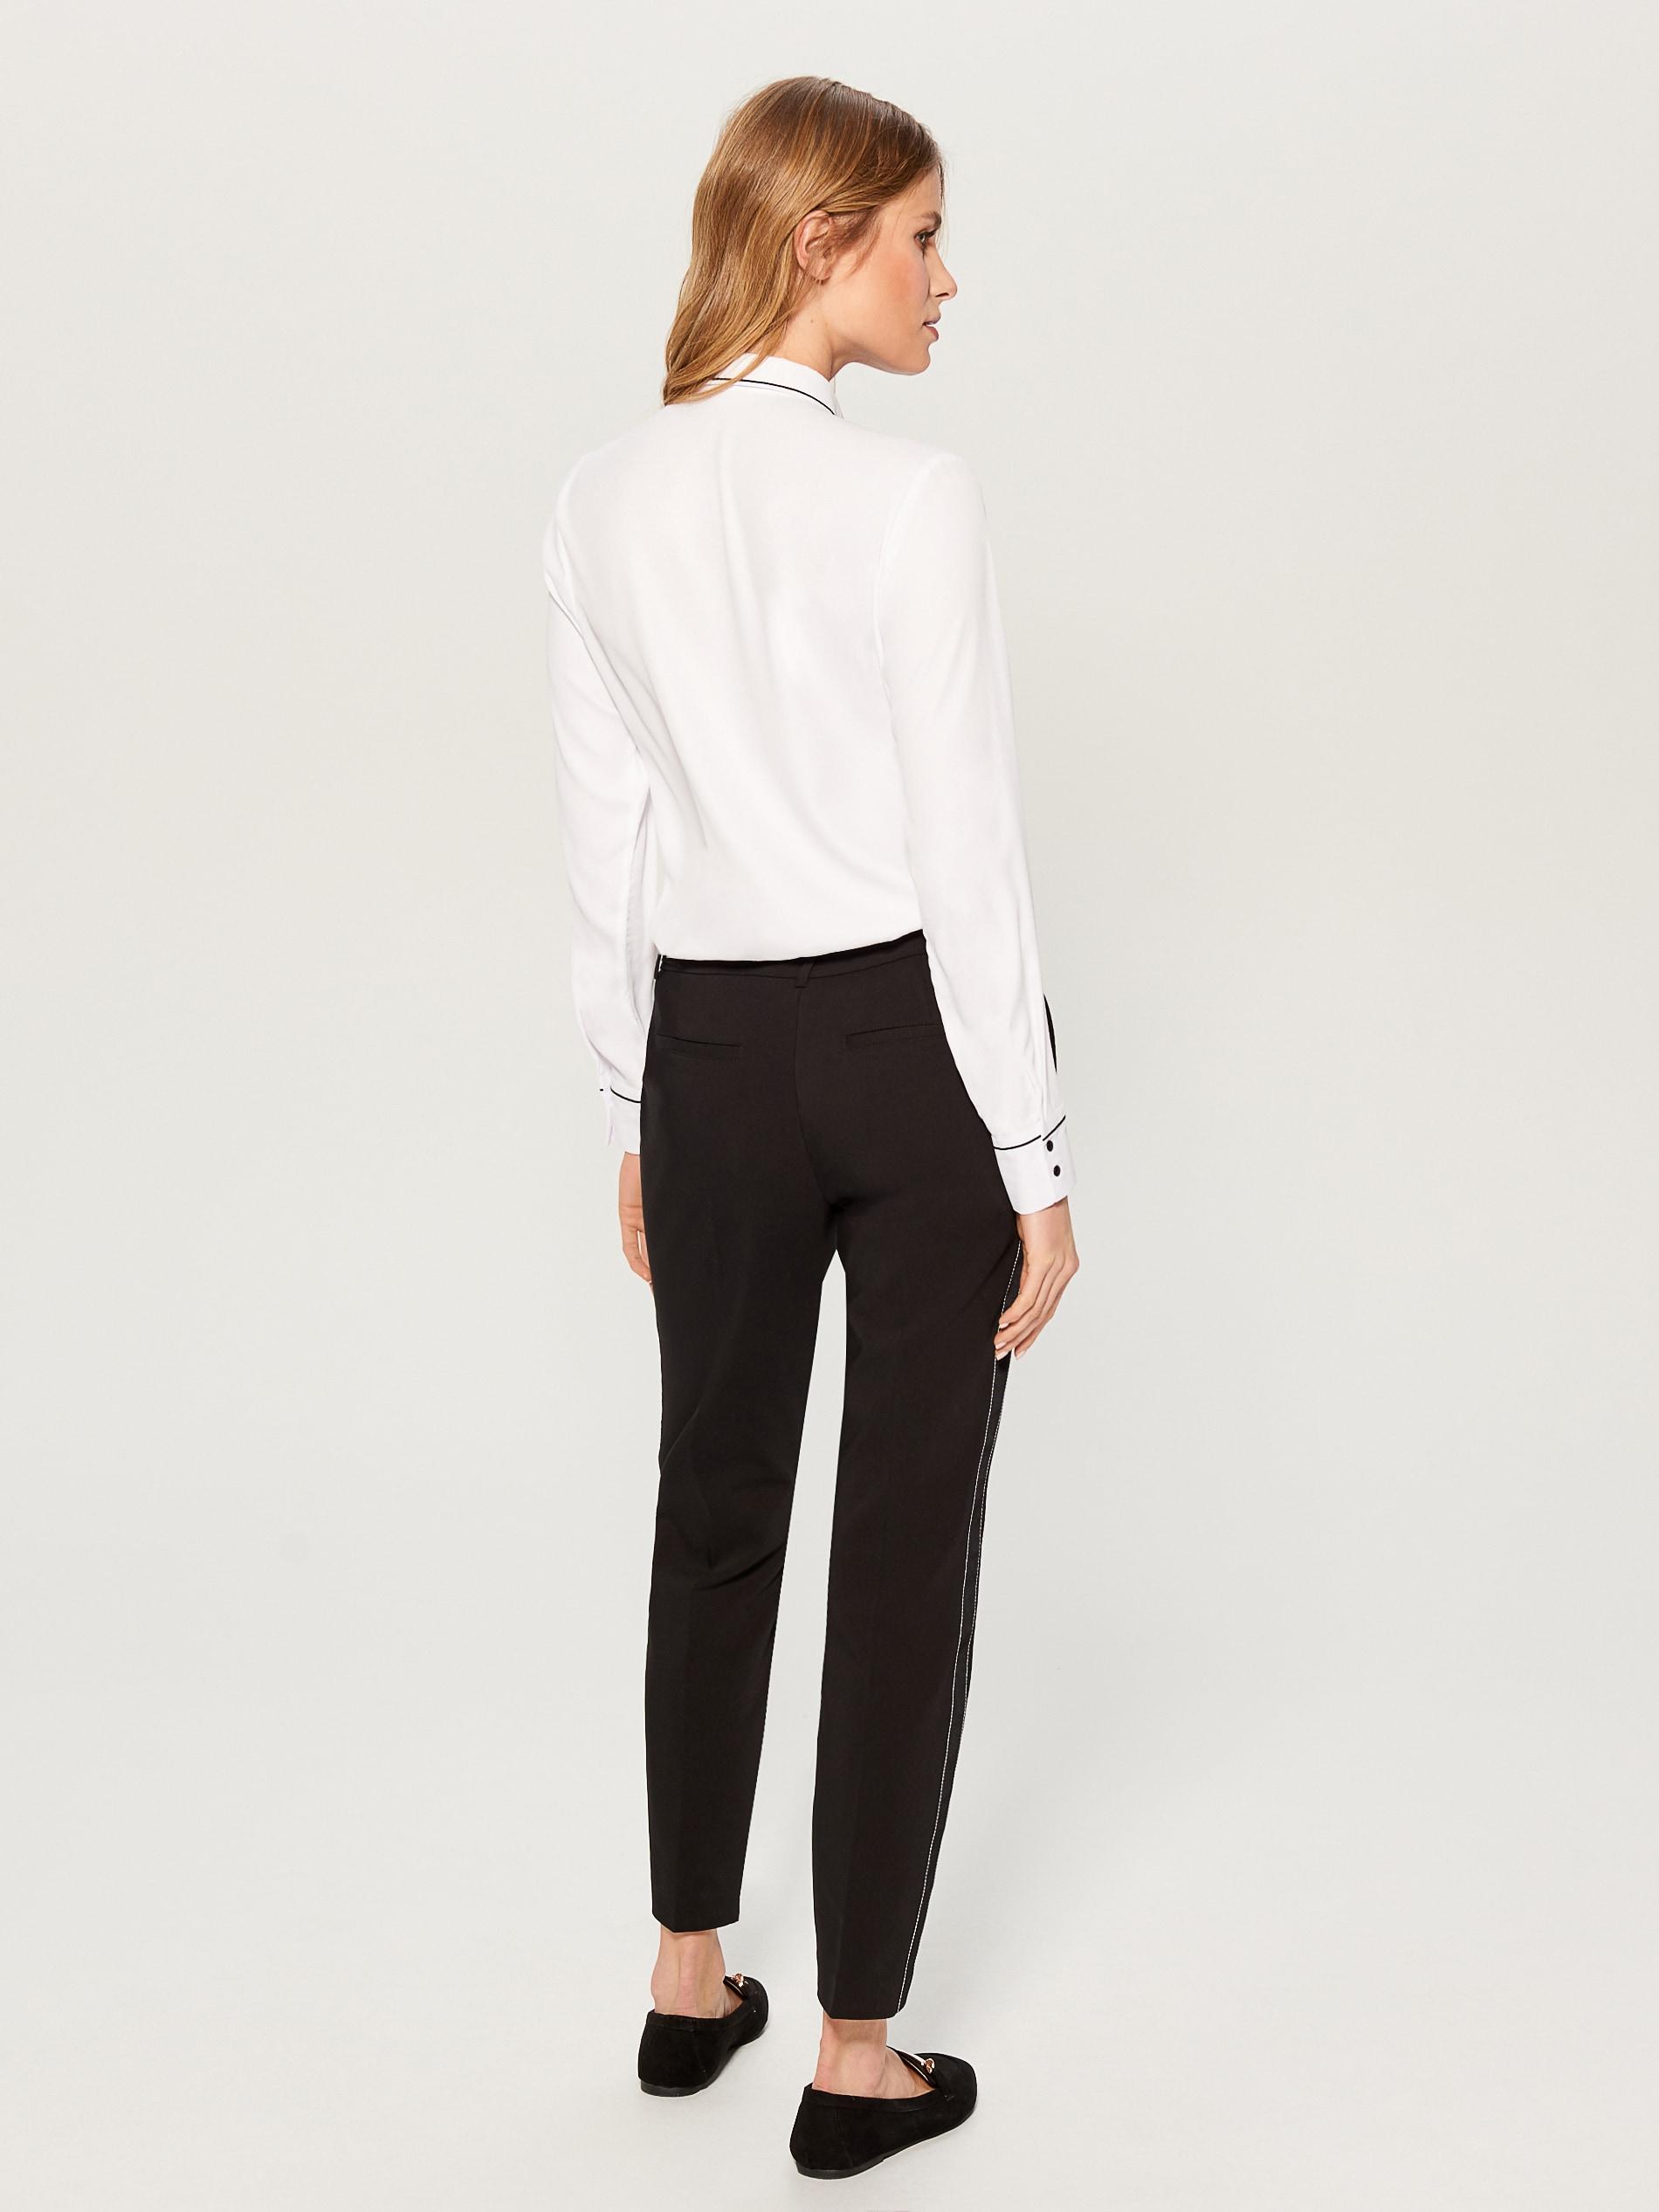 37acb8c4955 Košile s krátkými rukávy a kontrastními švy - bílá - VB663-00X - Mohito -